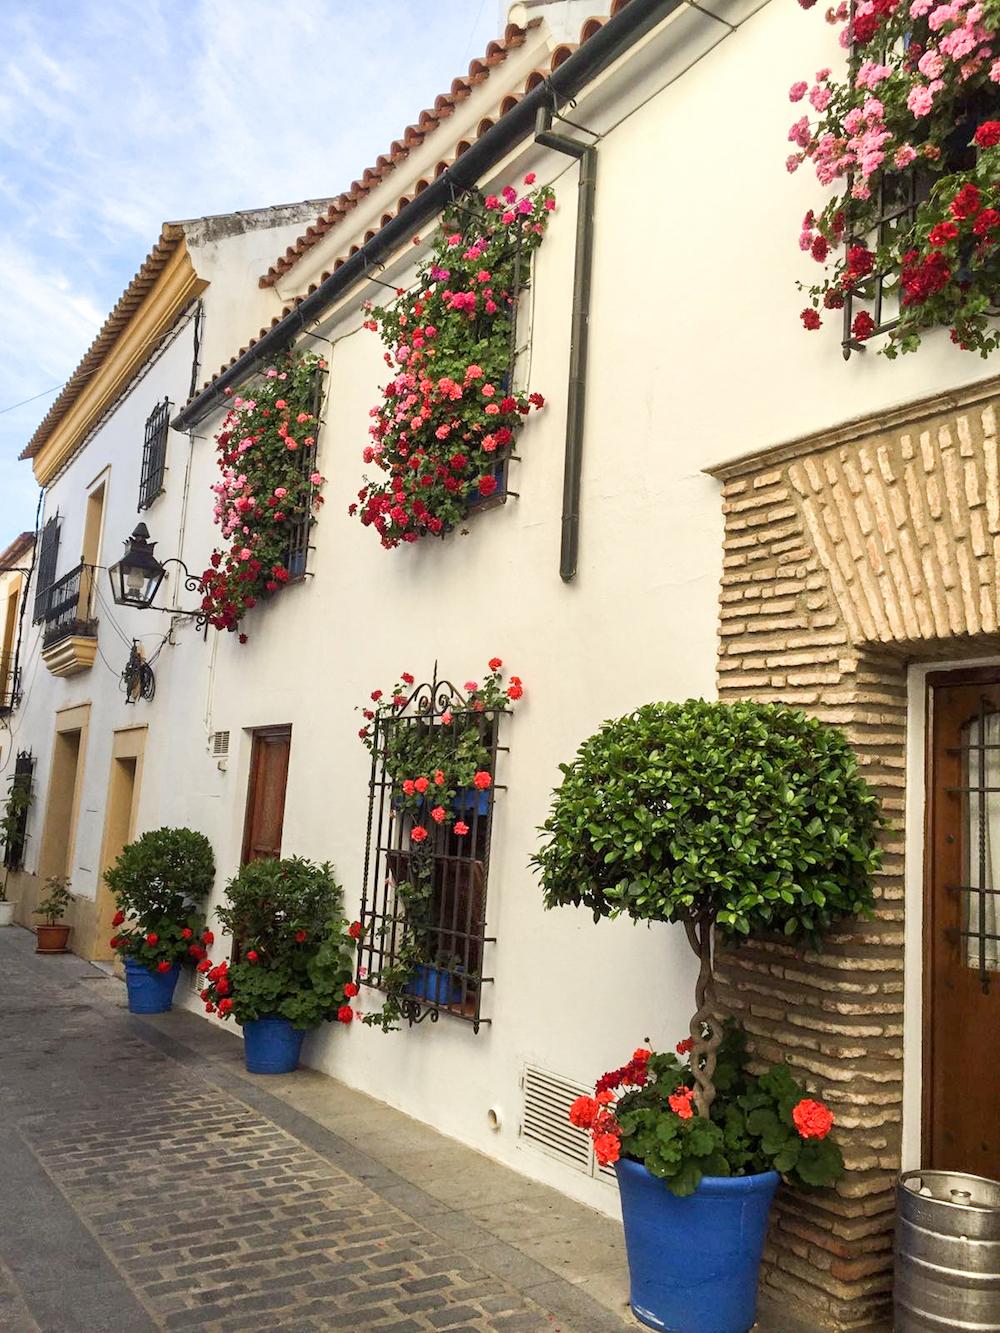 12 - festival in córdoba - romantische streken - straatje - bloemen